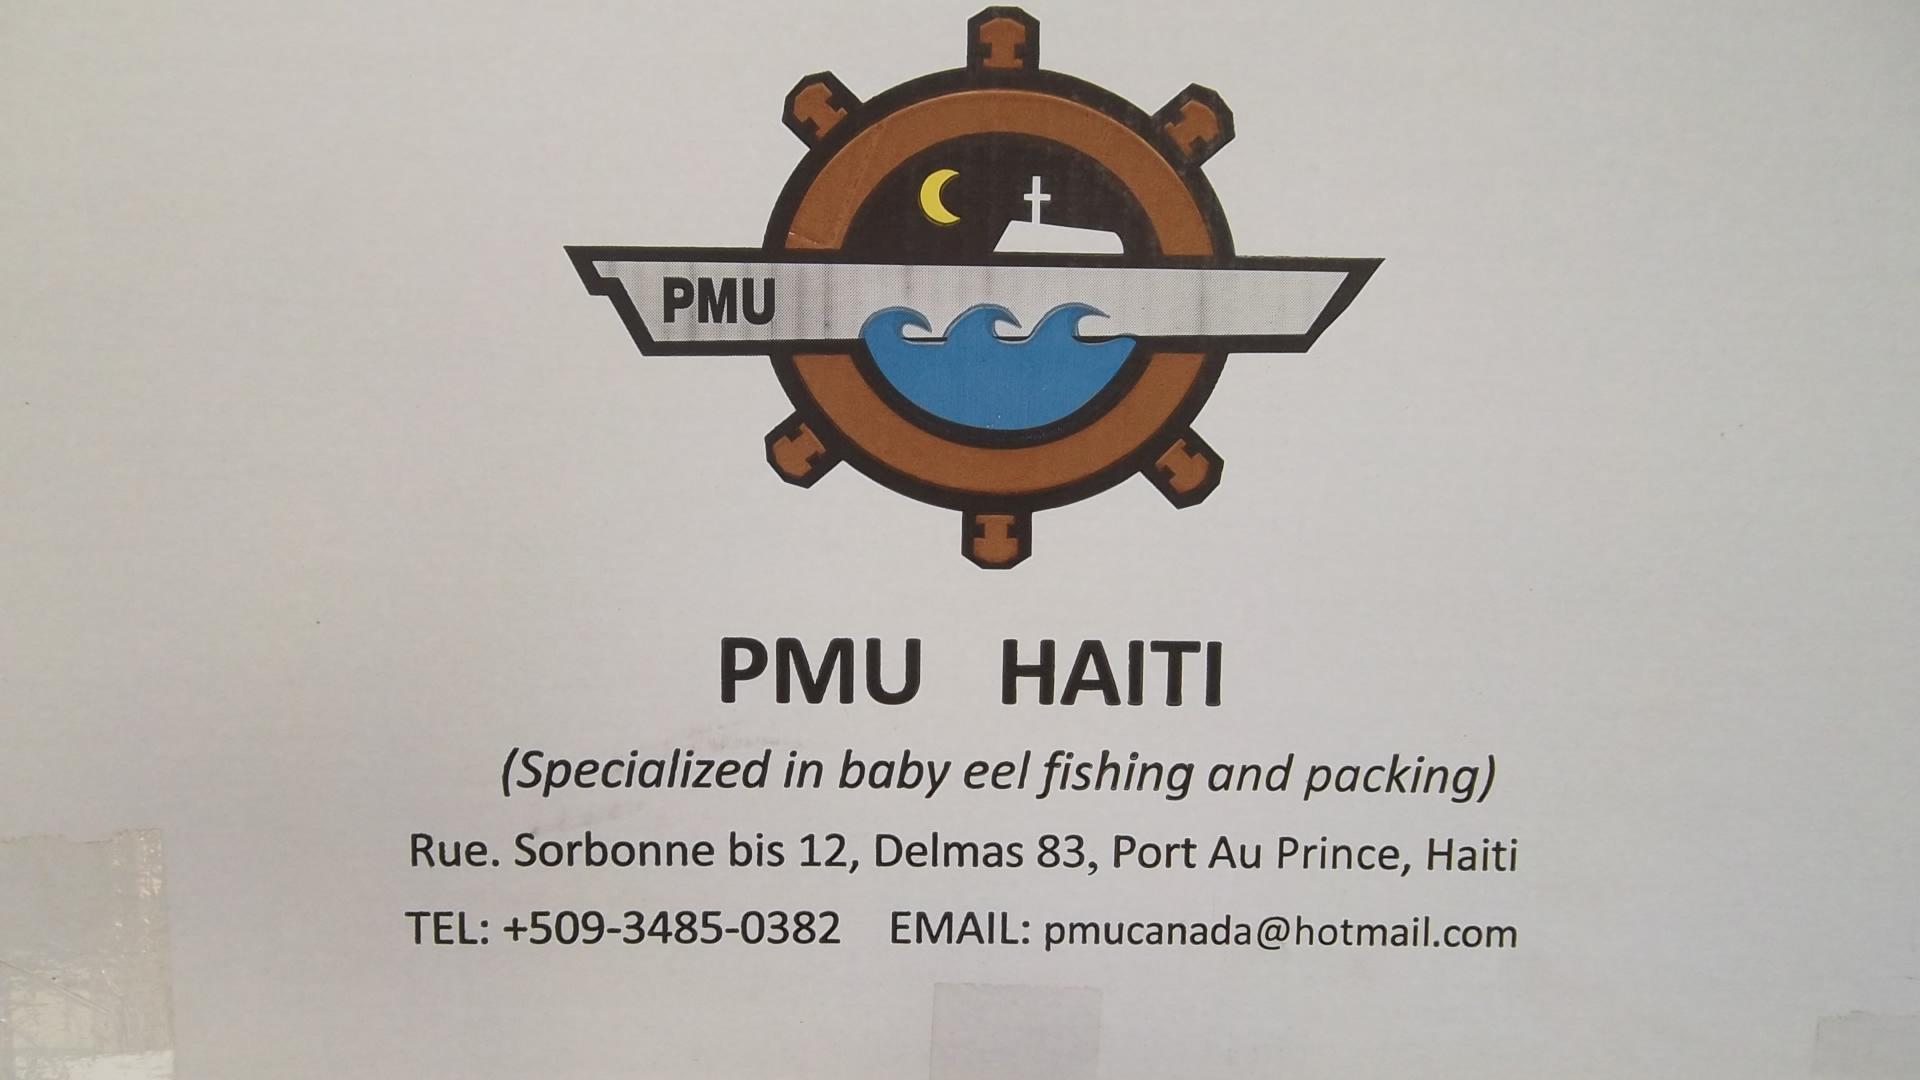 PMUGROUP logo